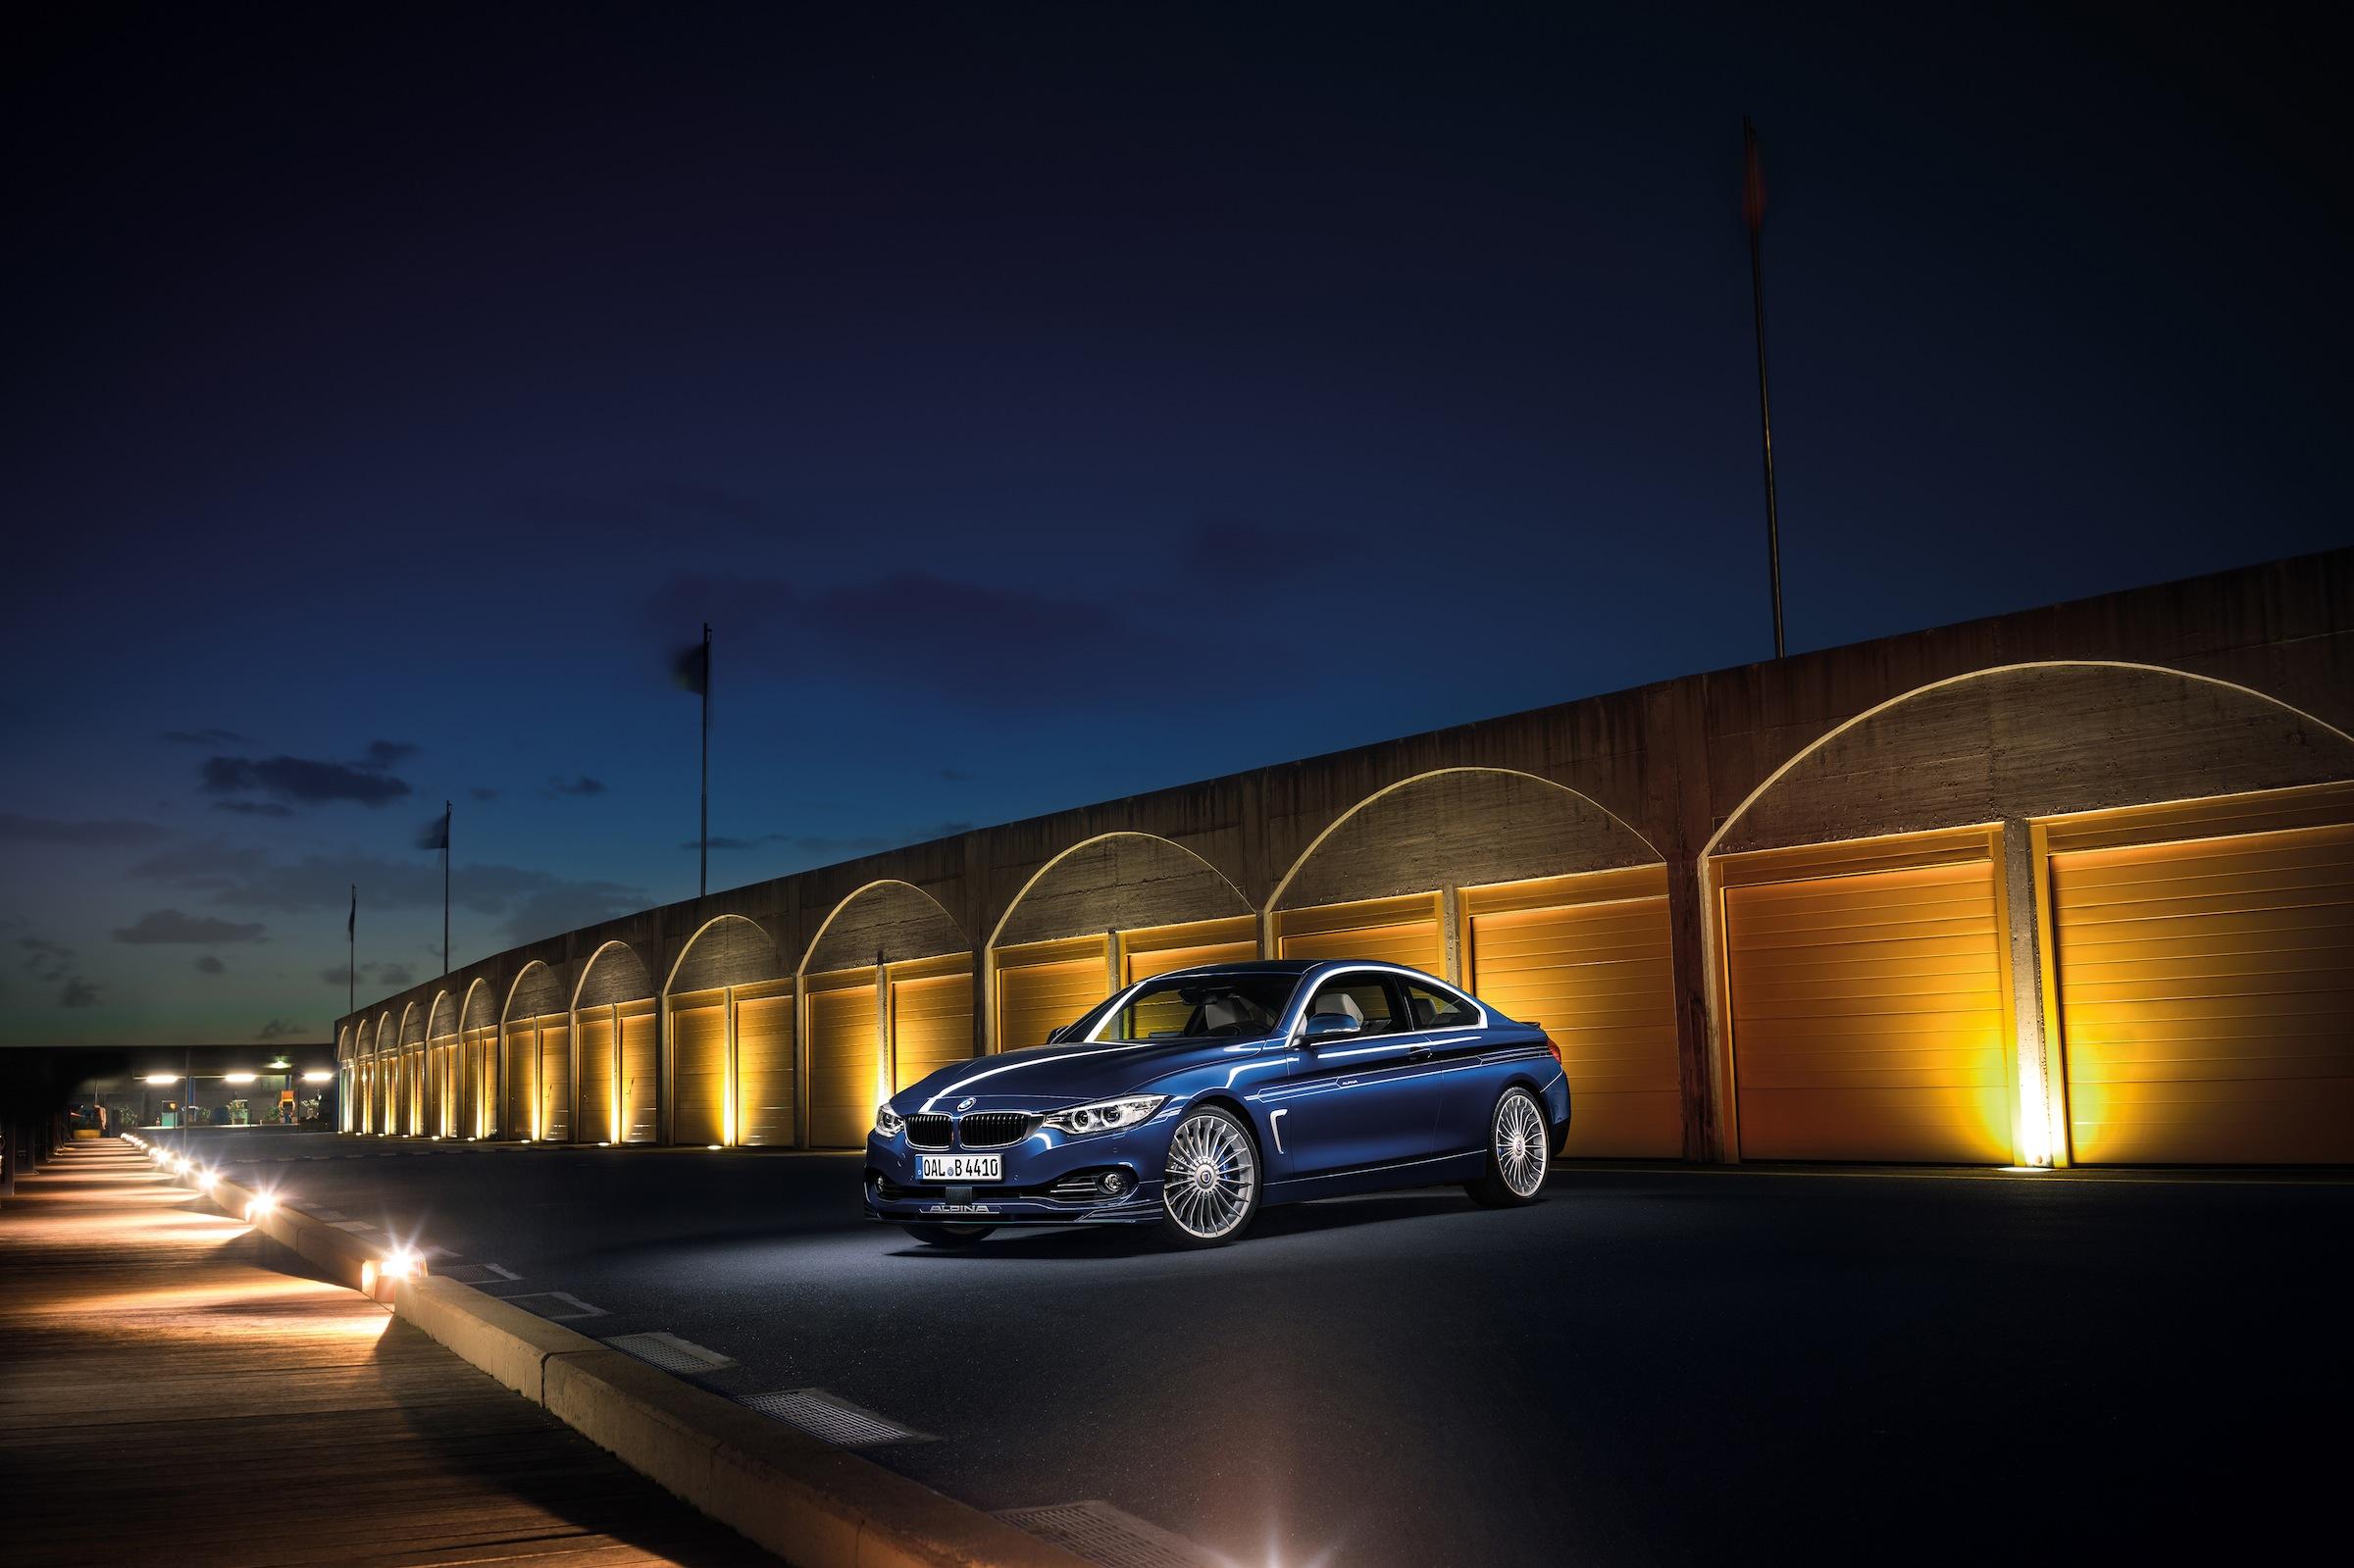 BMW ALPINA B4 BITURBO 08